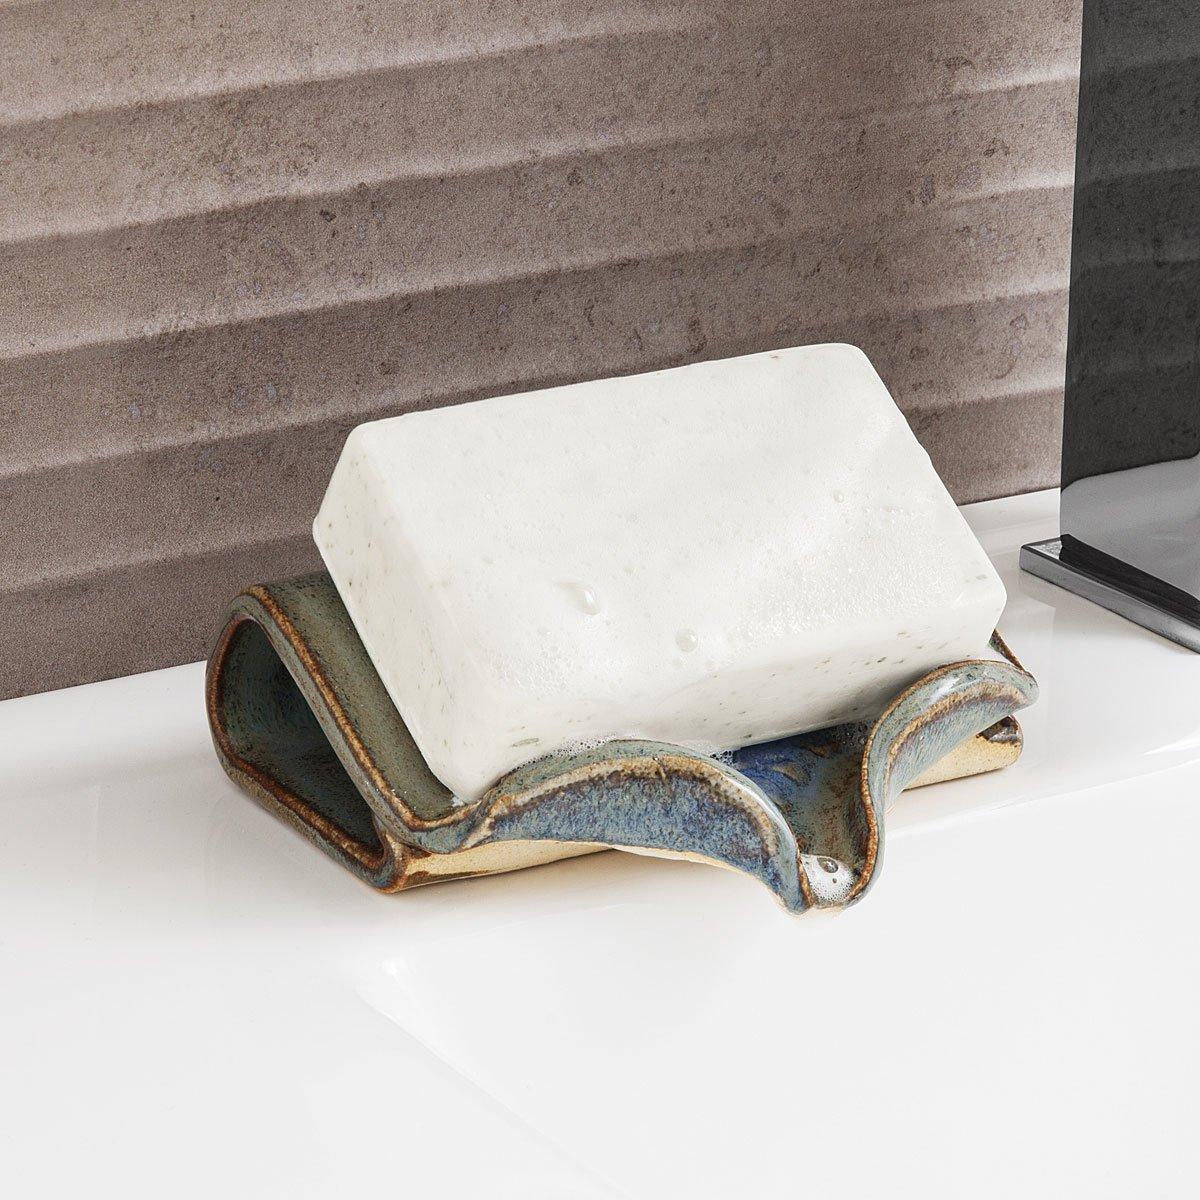 Ceramic Self Draining Soap Dish | UncommonGoods